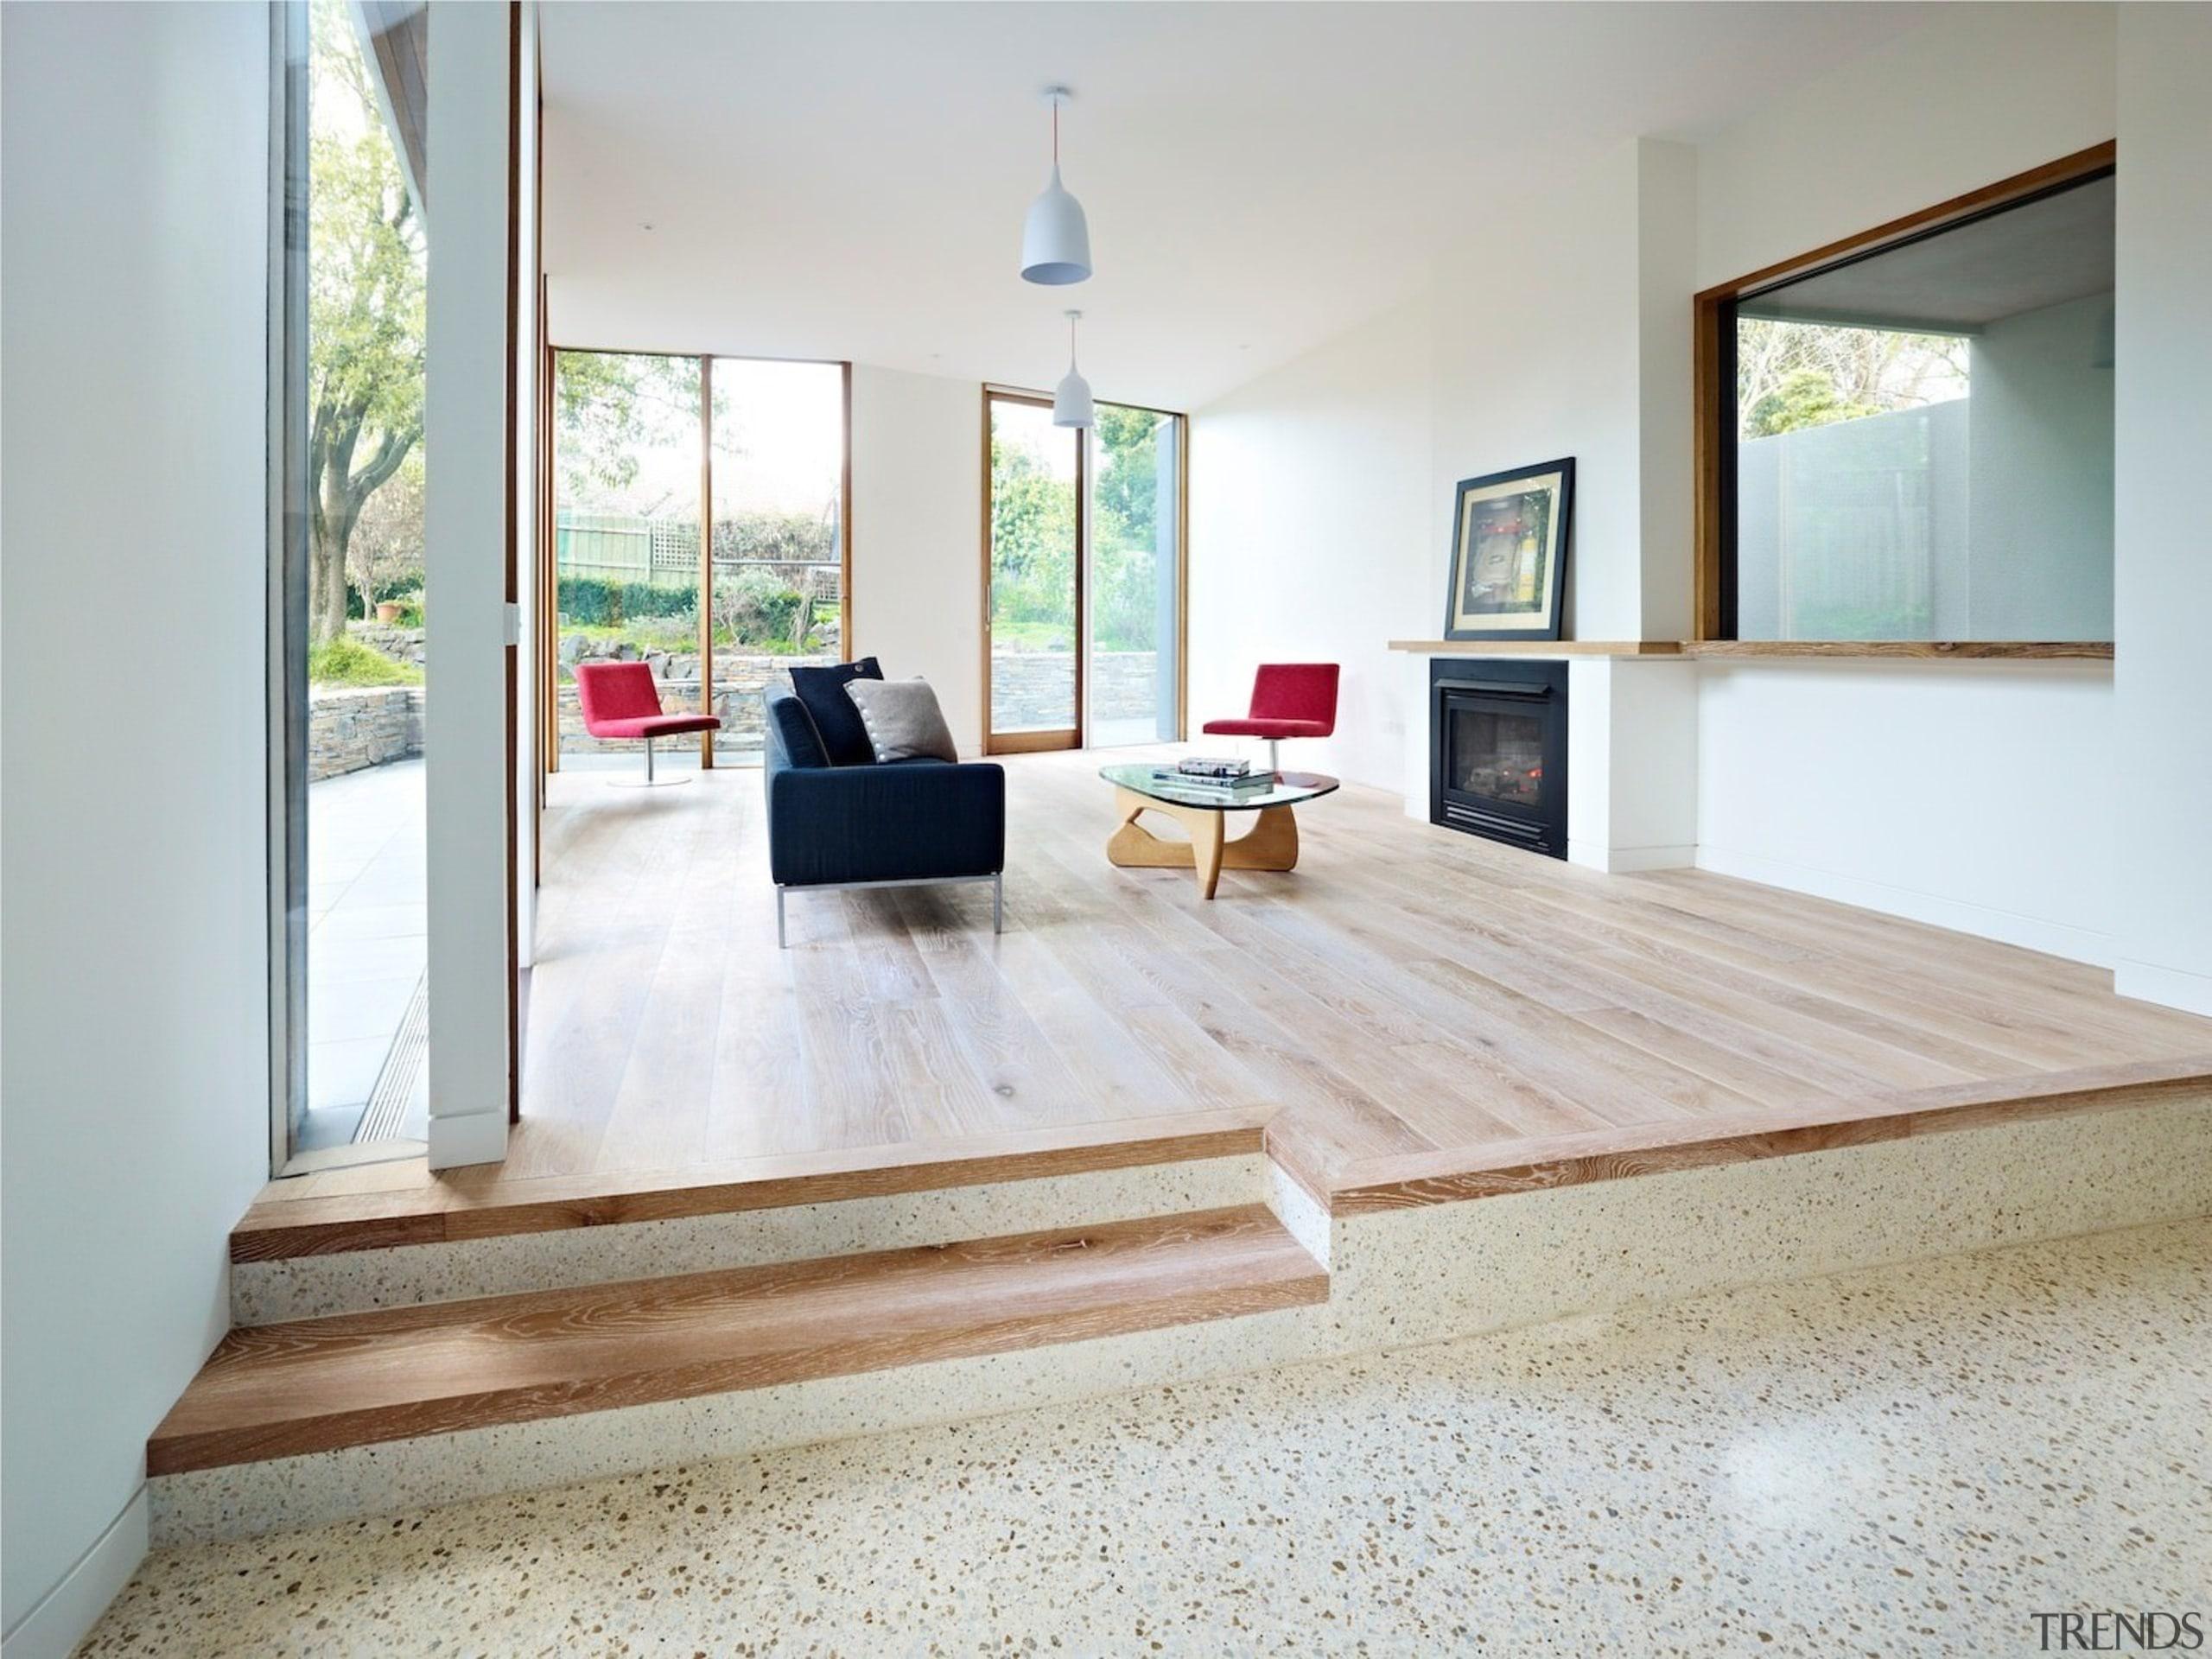 Architect: Steffen Welsch ArchitectsPhotography: Rhiannon Slatter floor, flooring, furniture, hardwood, house, interior design, laminate flooring, living room, property, real estate, table, wood, wood flooring, white, gray